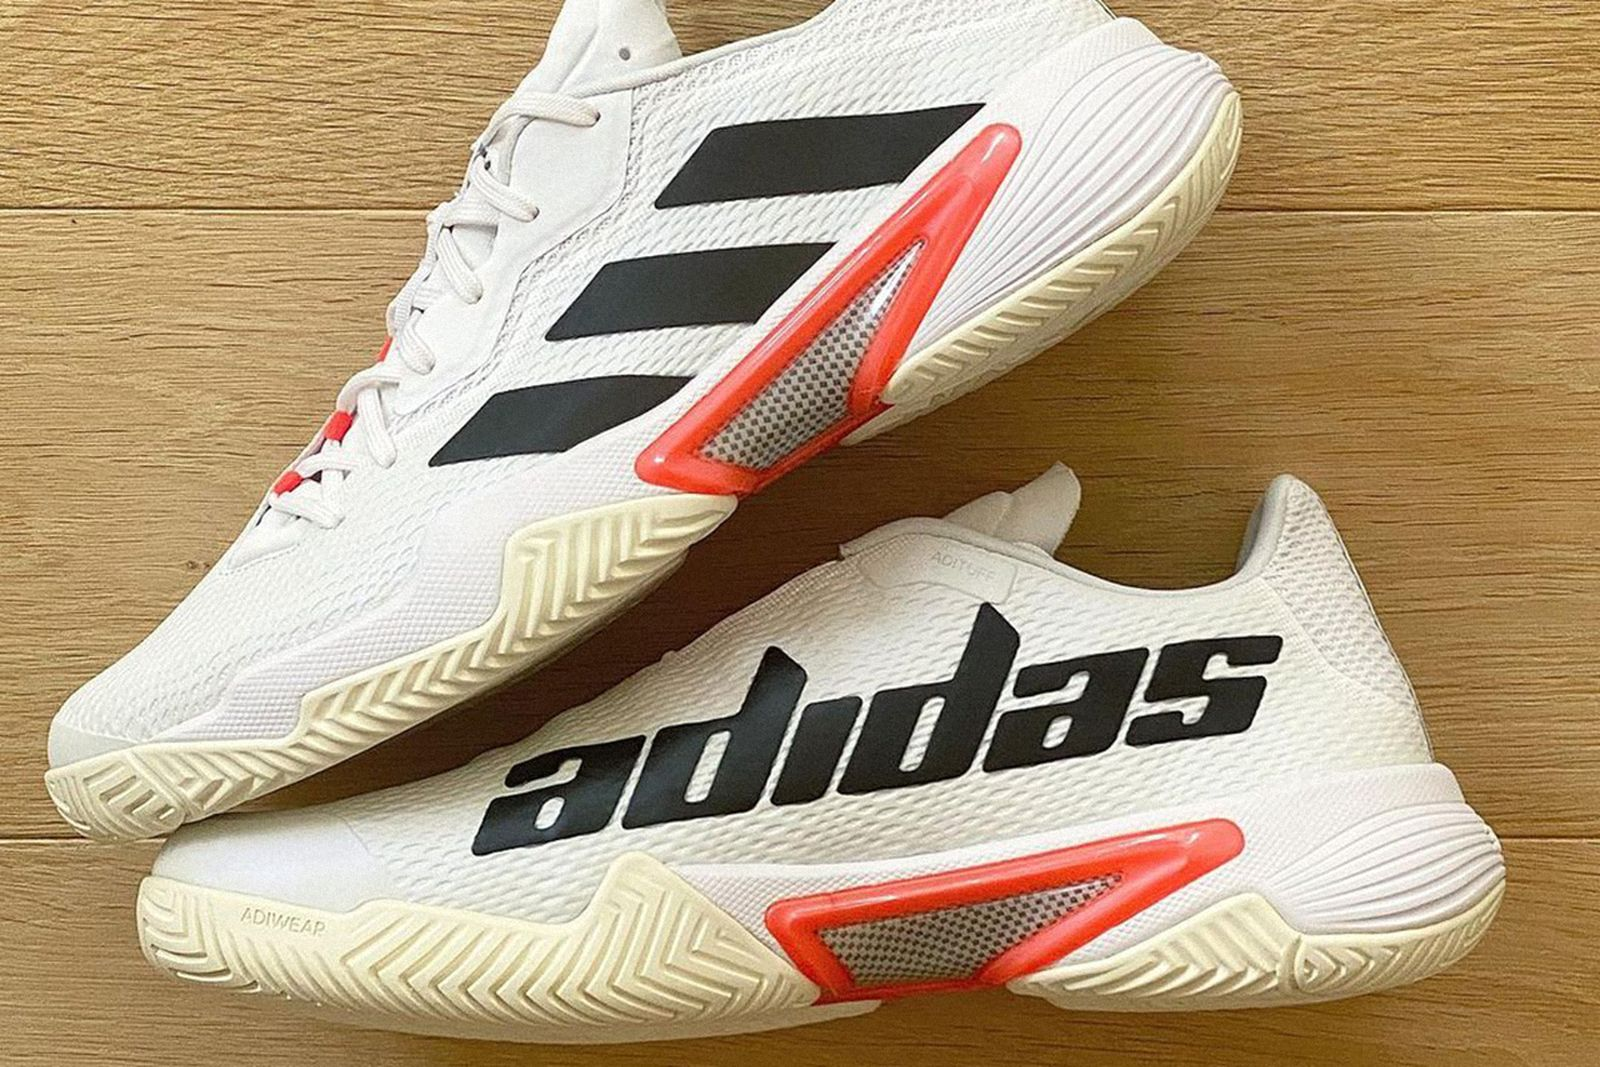 adidas-barricade-21-release-date-price-02